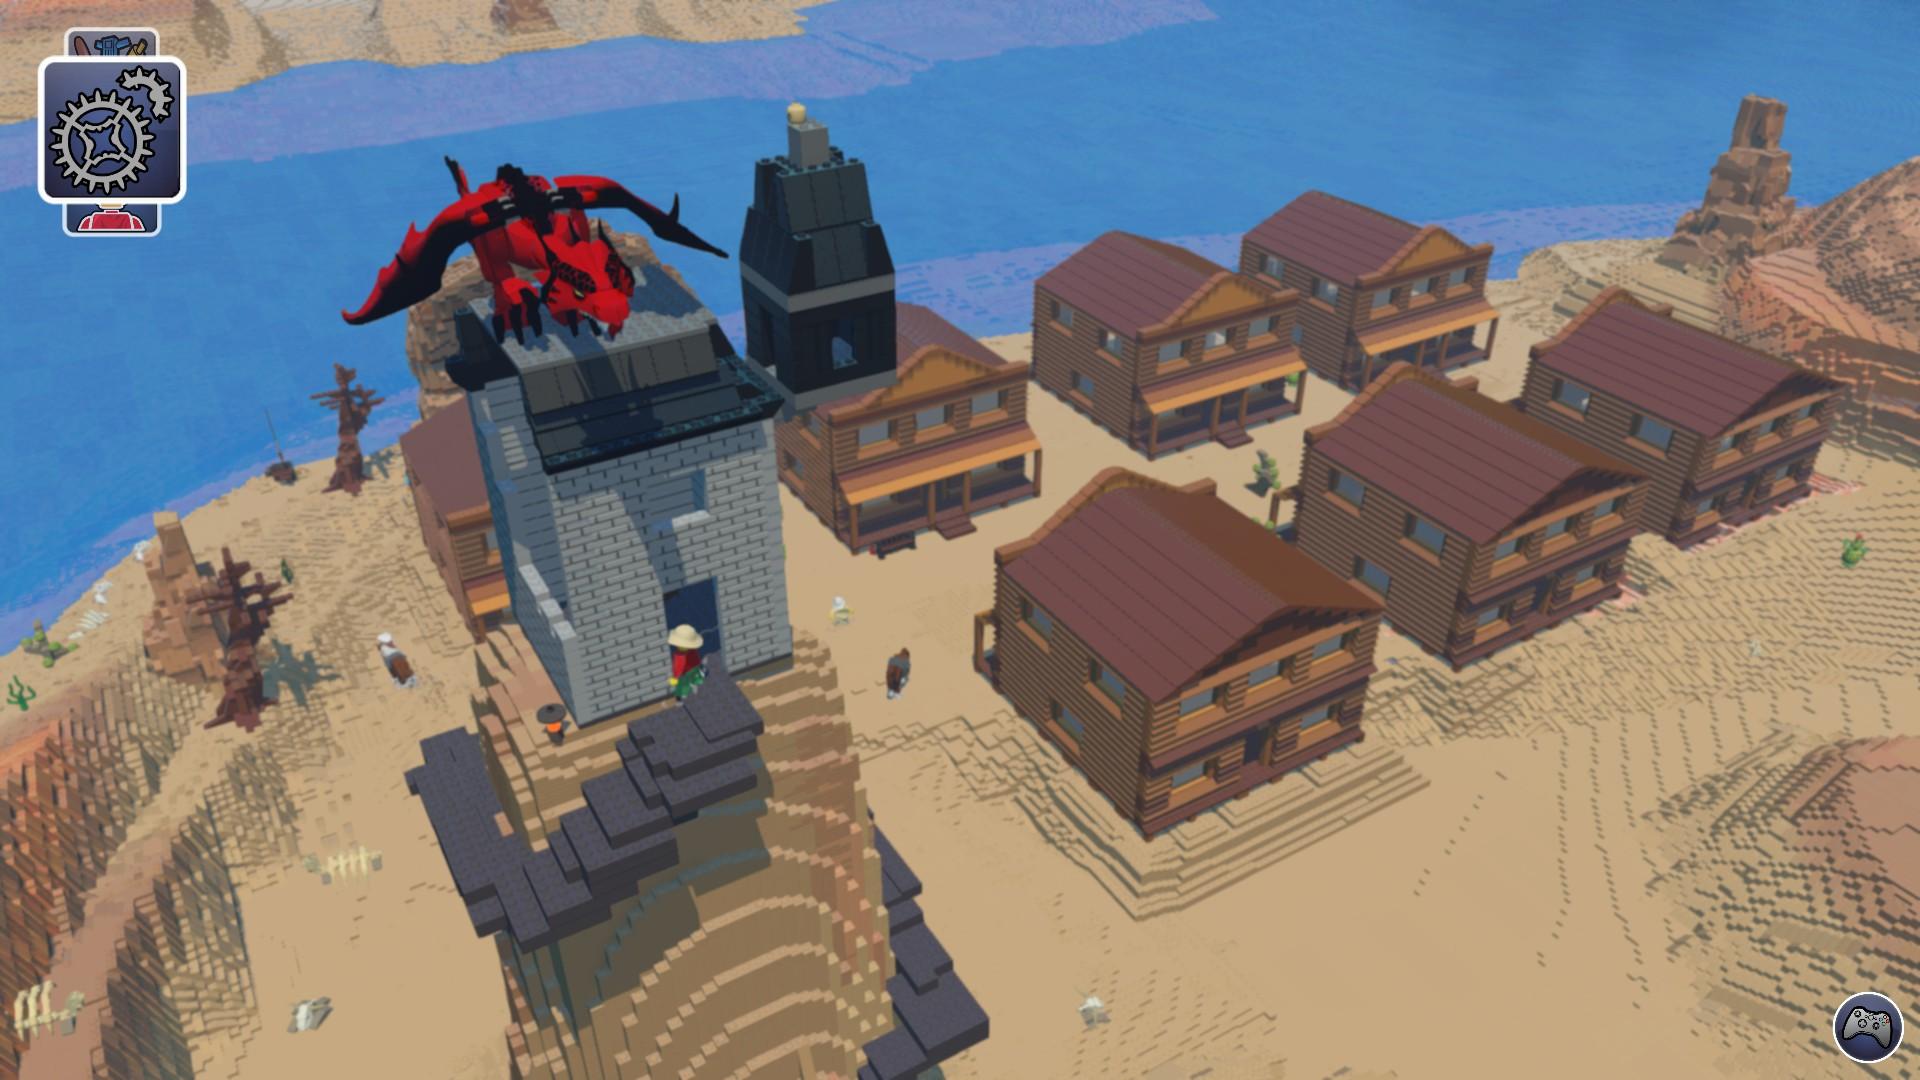 Lego Worlds Klasgame E Pin Ve Oyun Urunleri Satis Portali